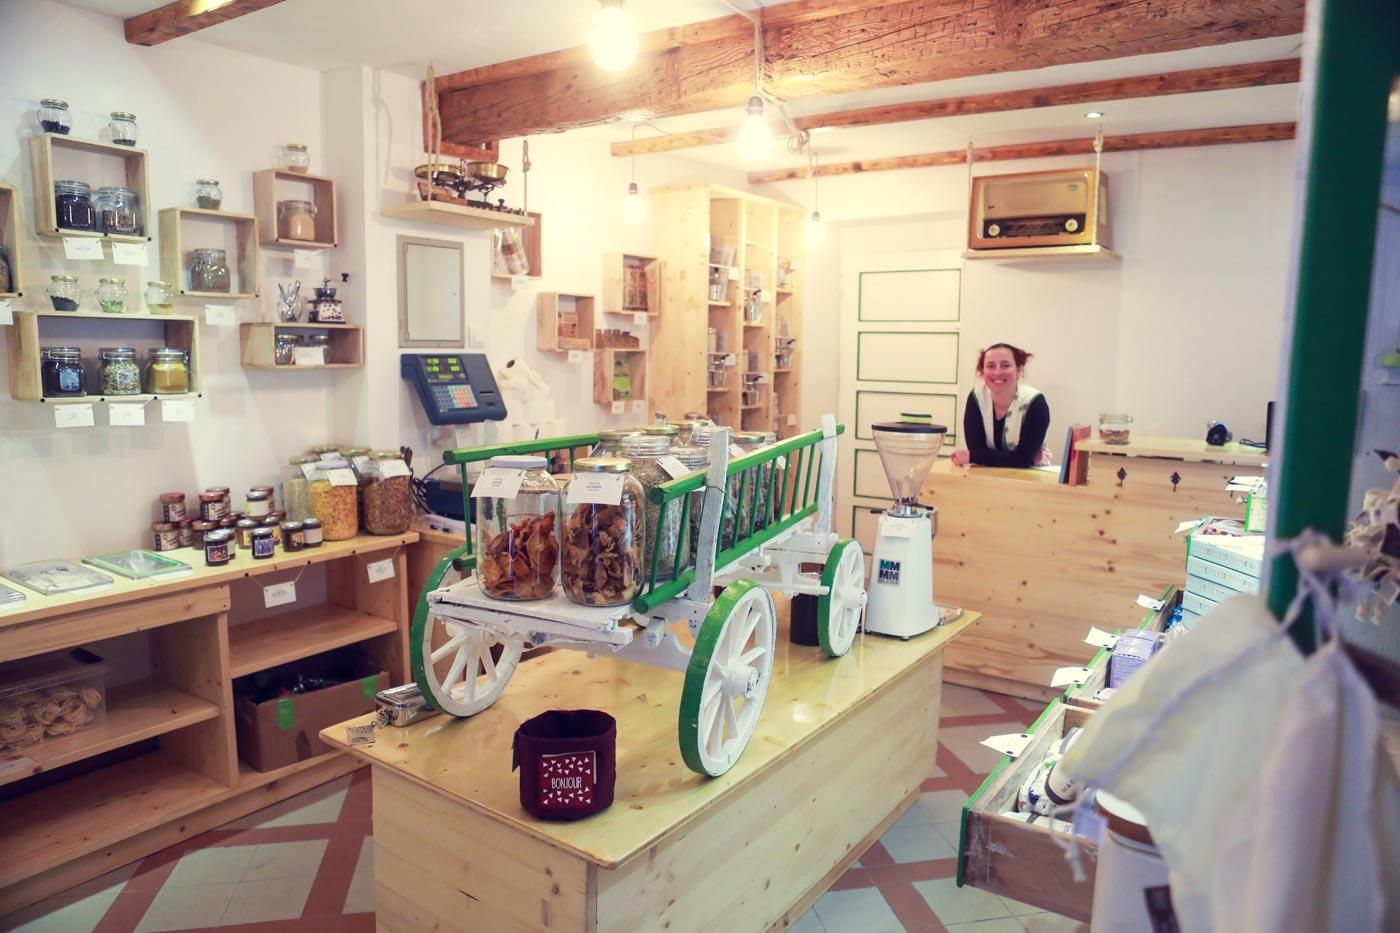 Ekola, trgovina brez embalaže - Koper